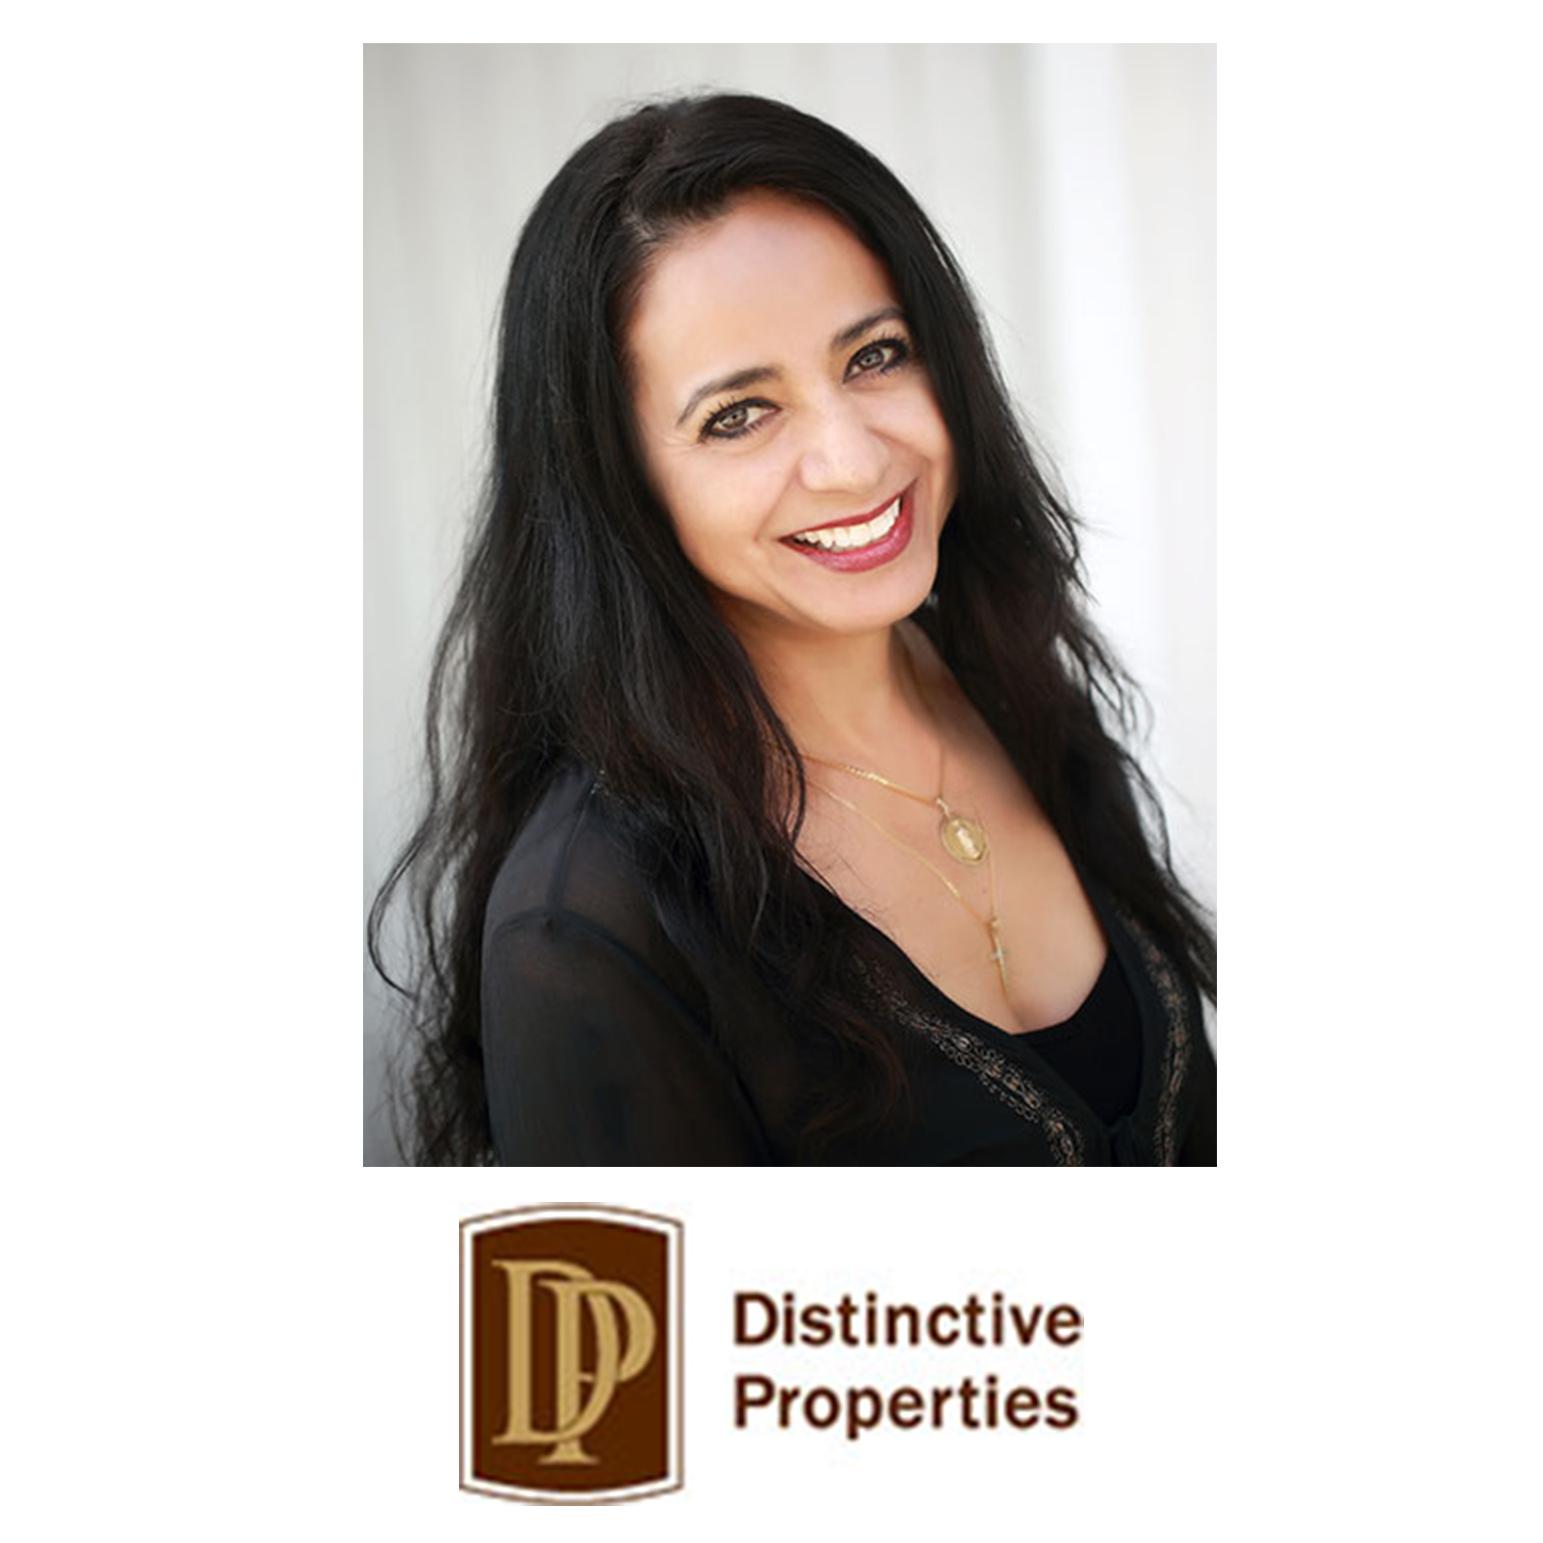 Lupe Ortega -Distinctive Properties